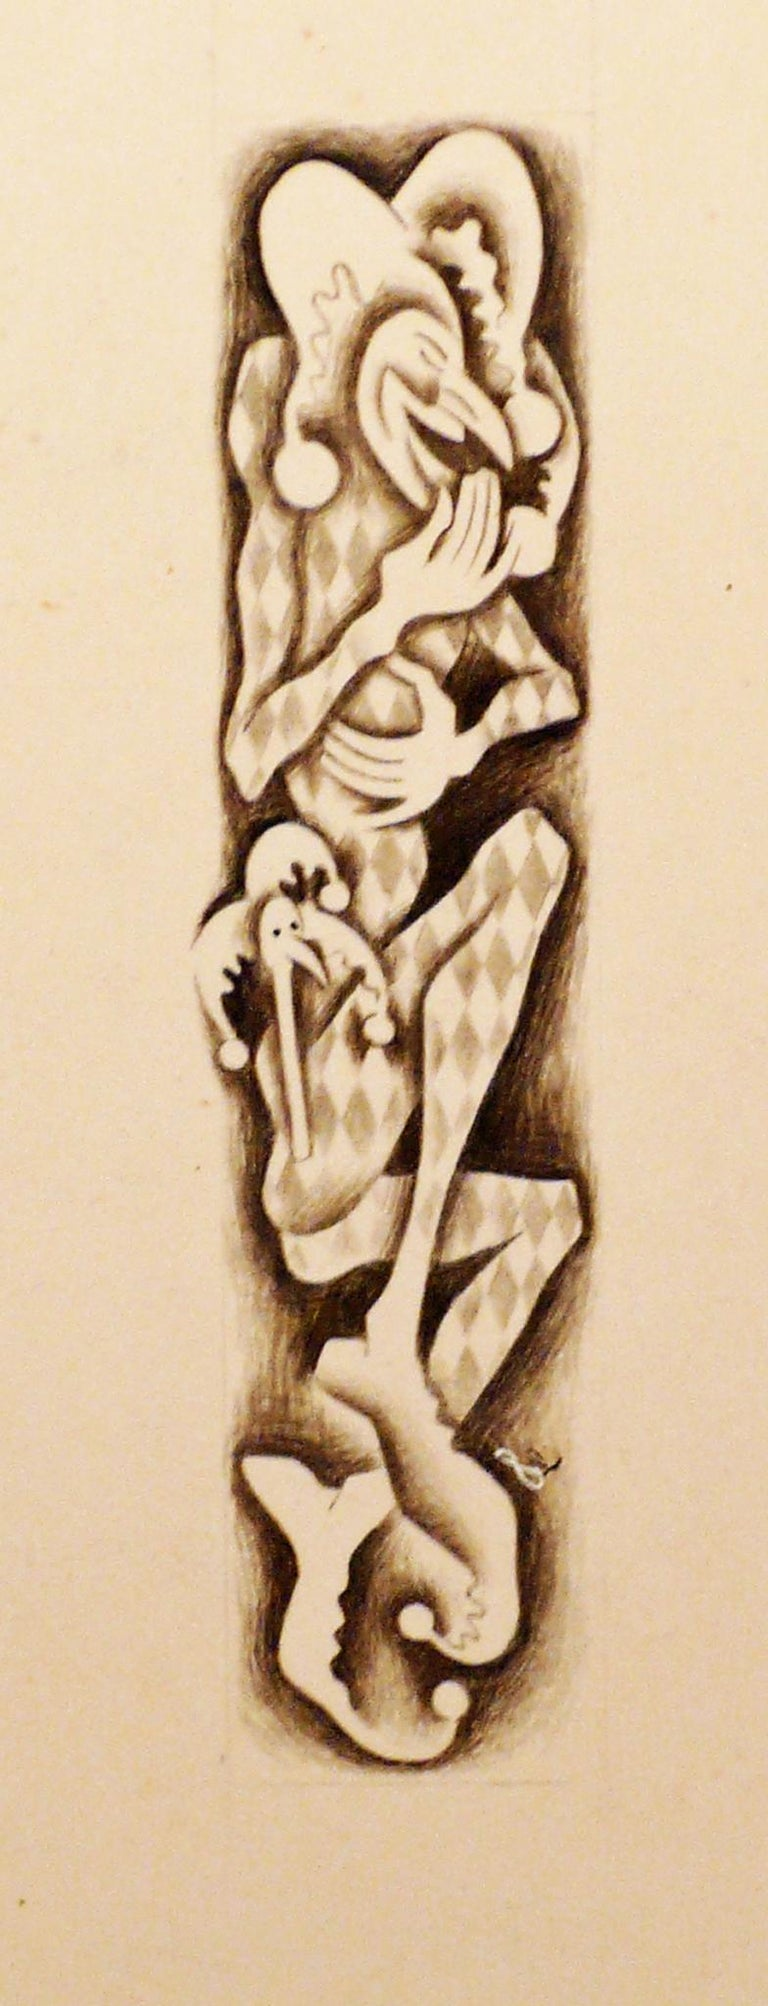 COMEDIA DEL ARTE - TWO DRAWINGS.  - Art by Francis Danovich